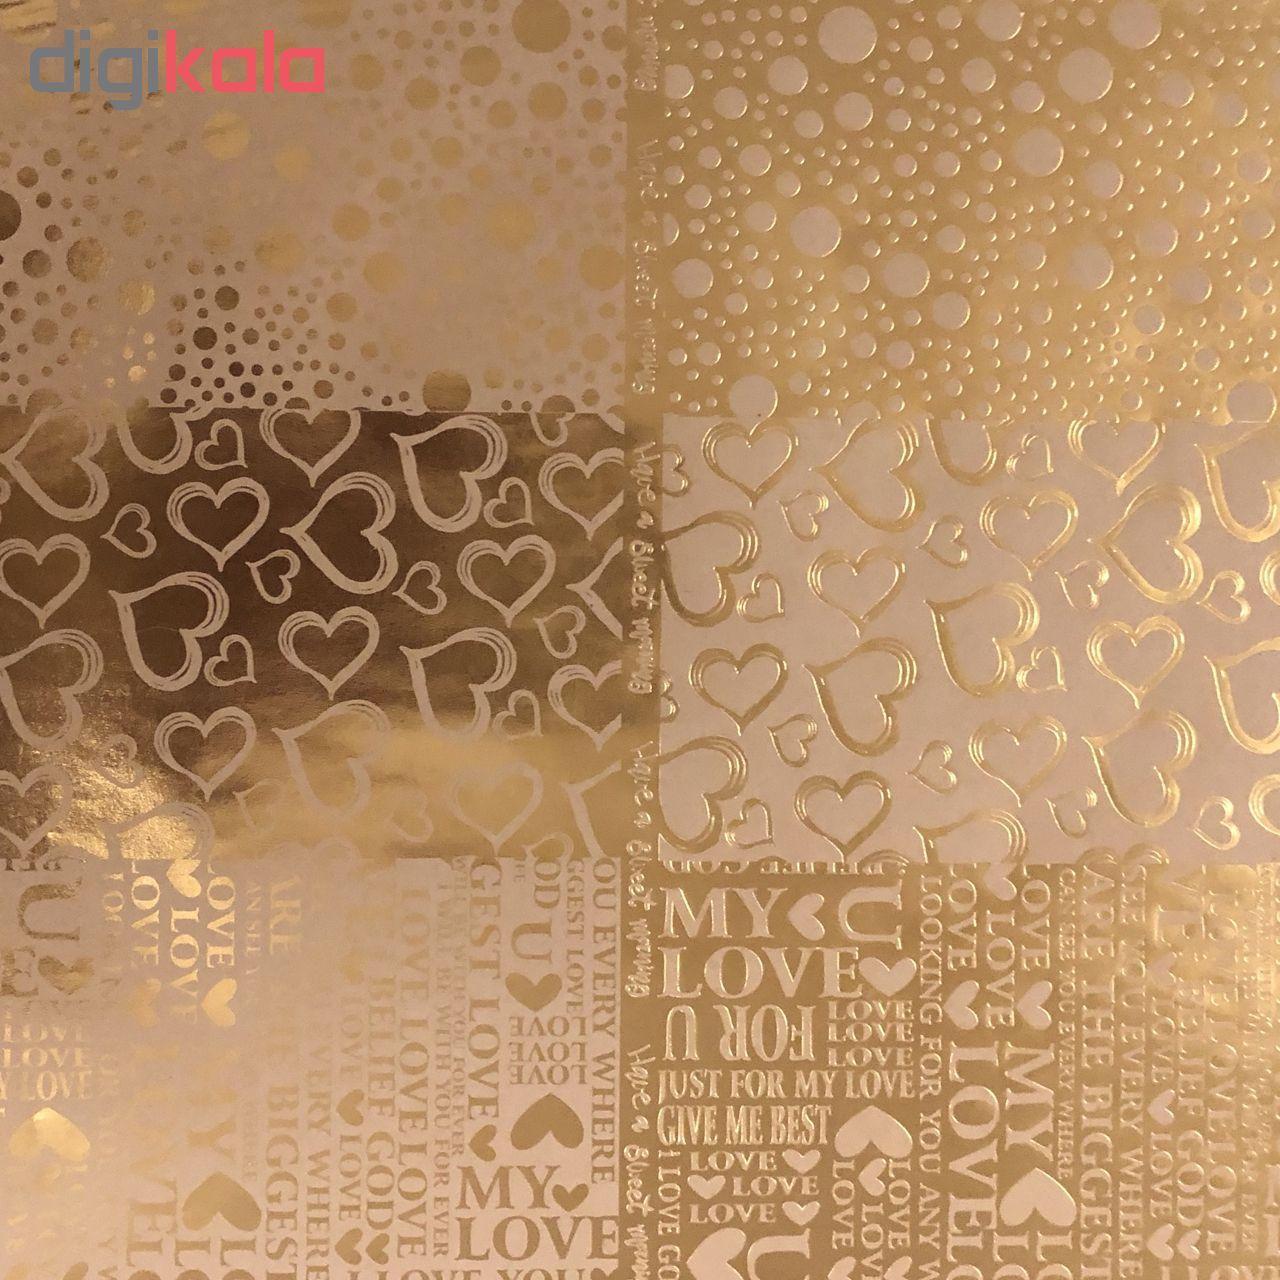 کاغذ کادو کرافت طرح قلب طلاکوب بسته 3 عددی main 1 1